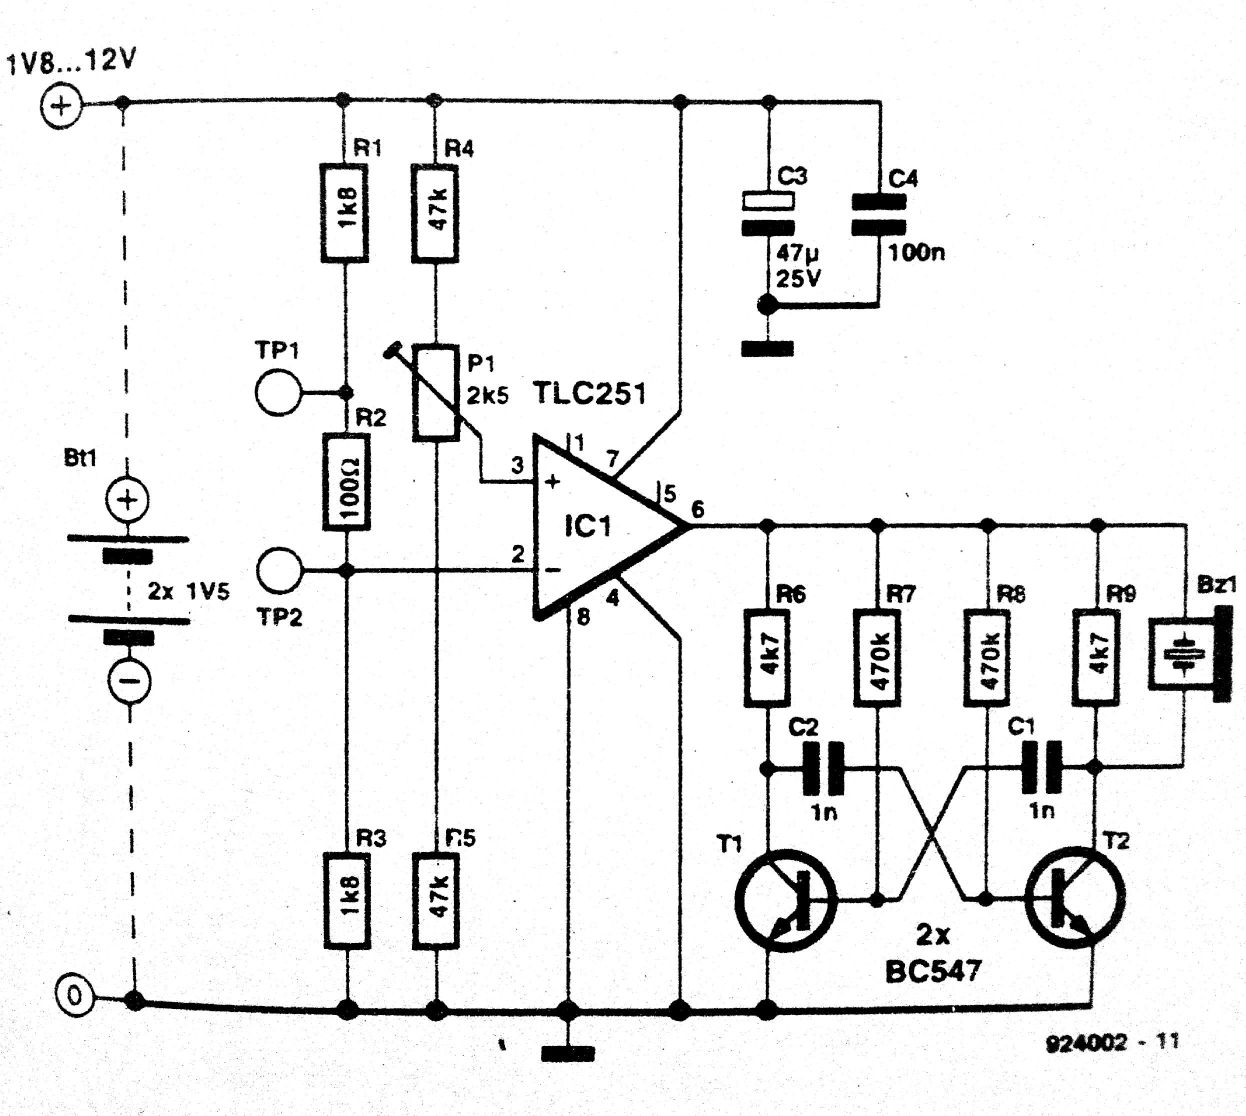 Enchanting Atx Power Supply Schematics Vignette - Electrical System ...